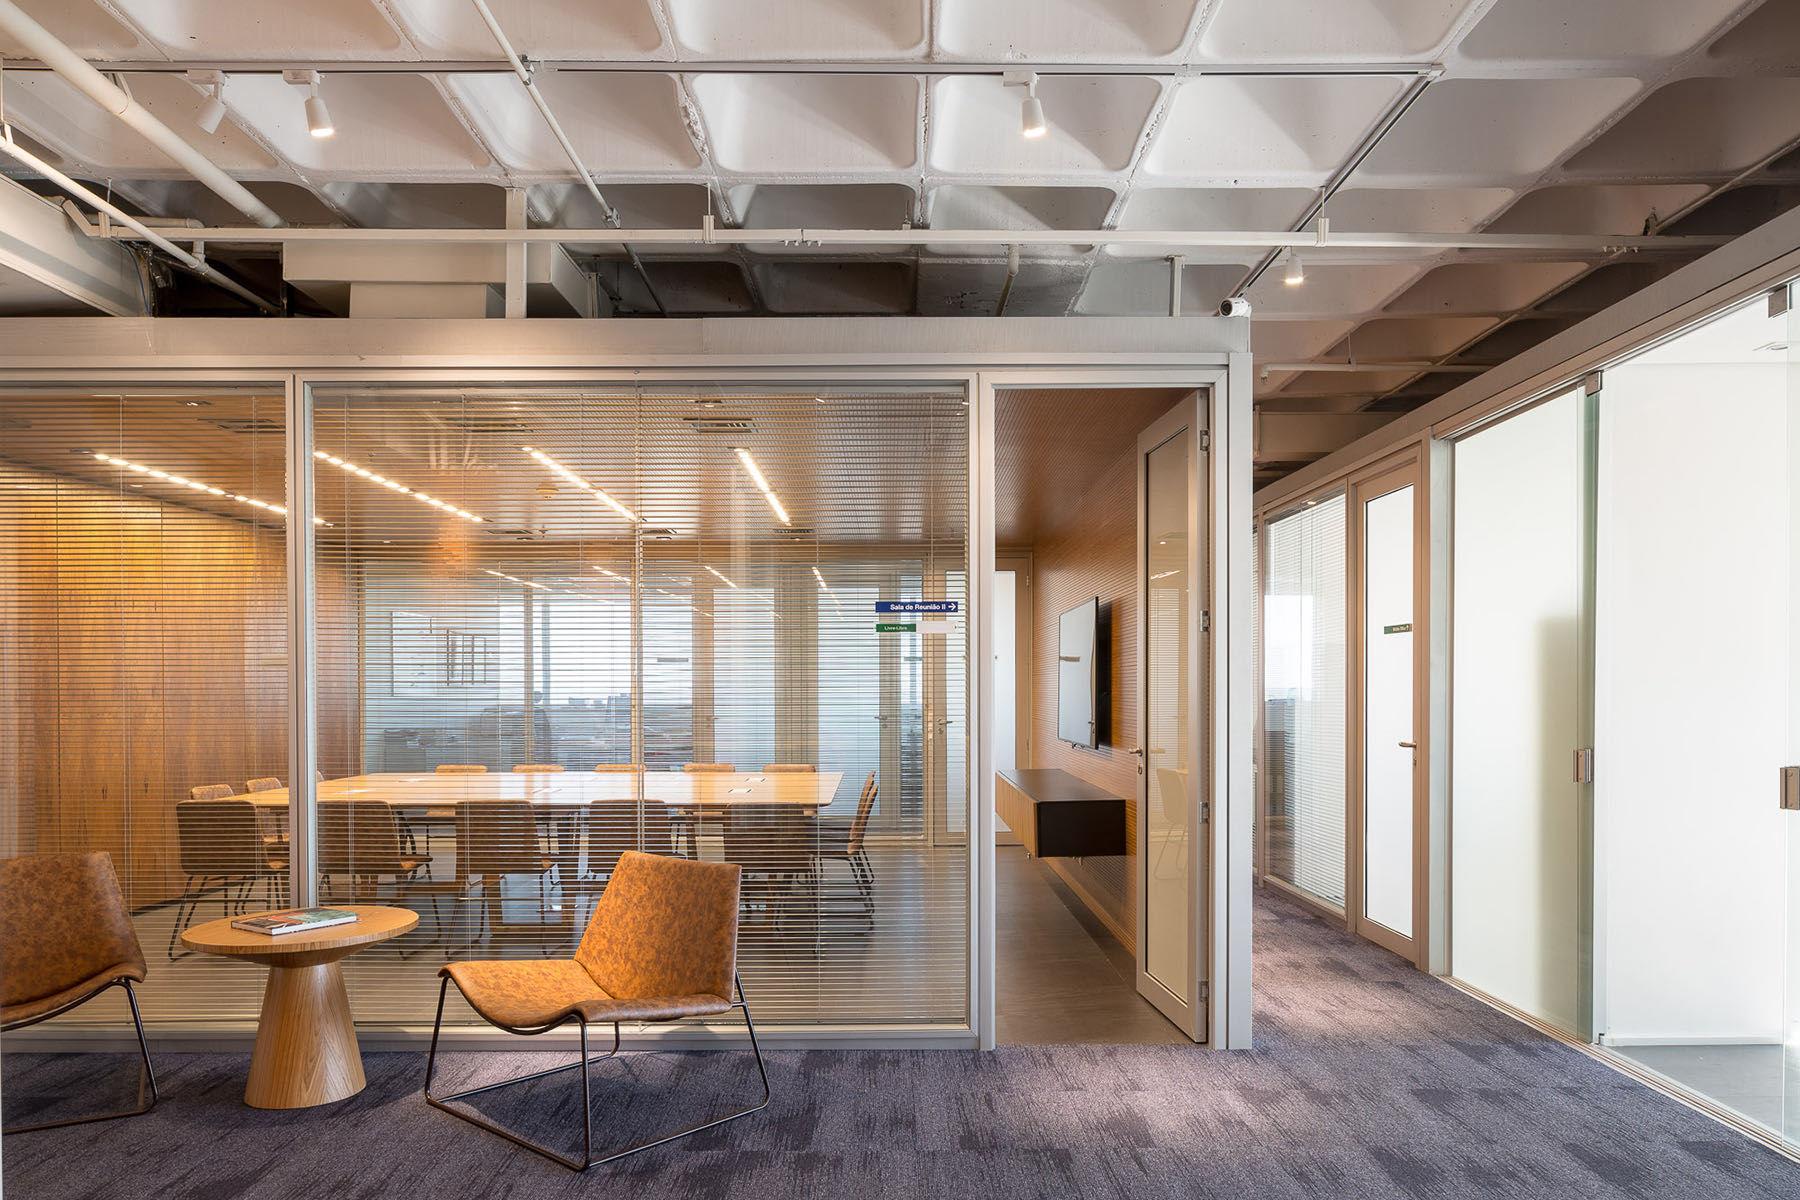 french-development-agency-office-11